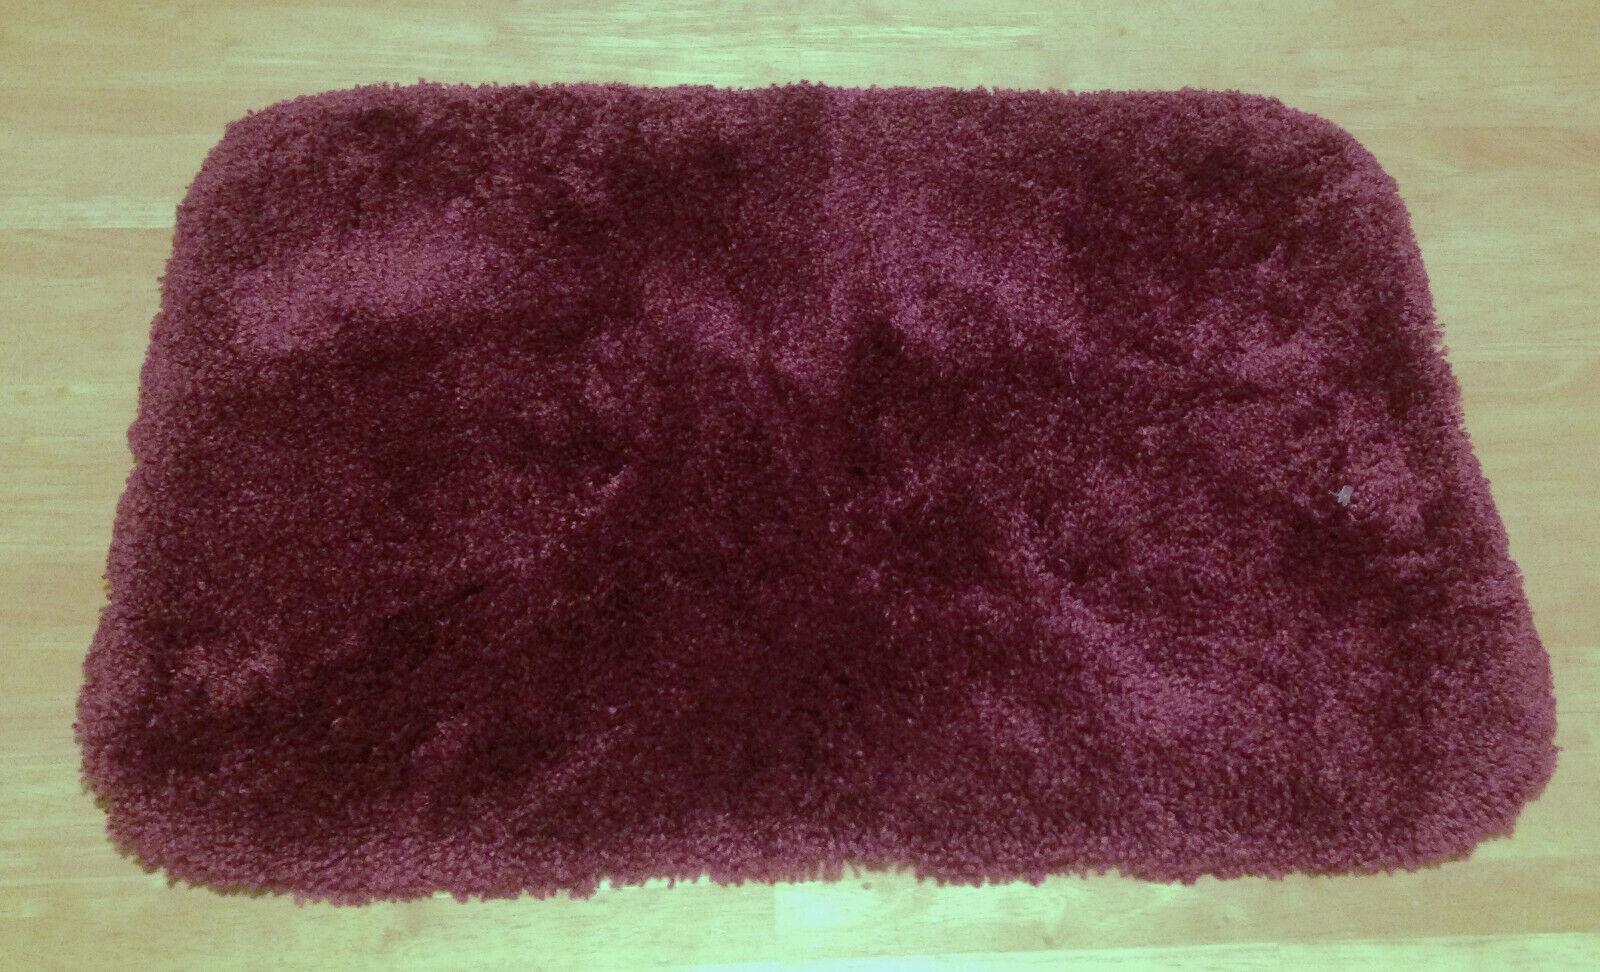 "Mowhawk Home Regency Bath Mat 17 x 24"" Burgundy Wine Nylon R"